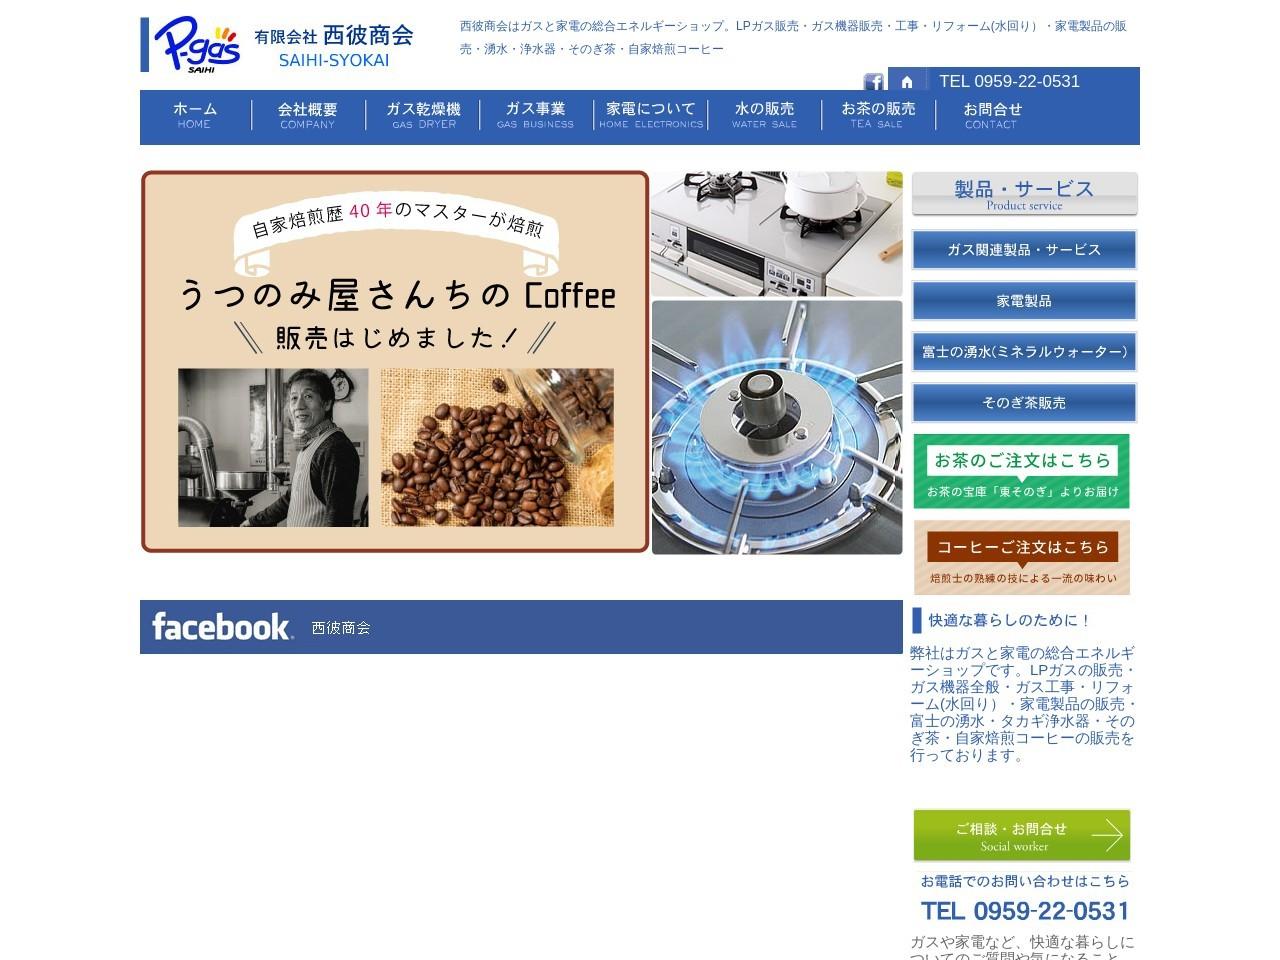 P-gas西彼商会|LPガス販売・ガス機器販売・リフォーム・オートガス・家電販売